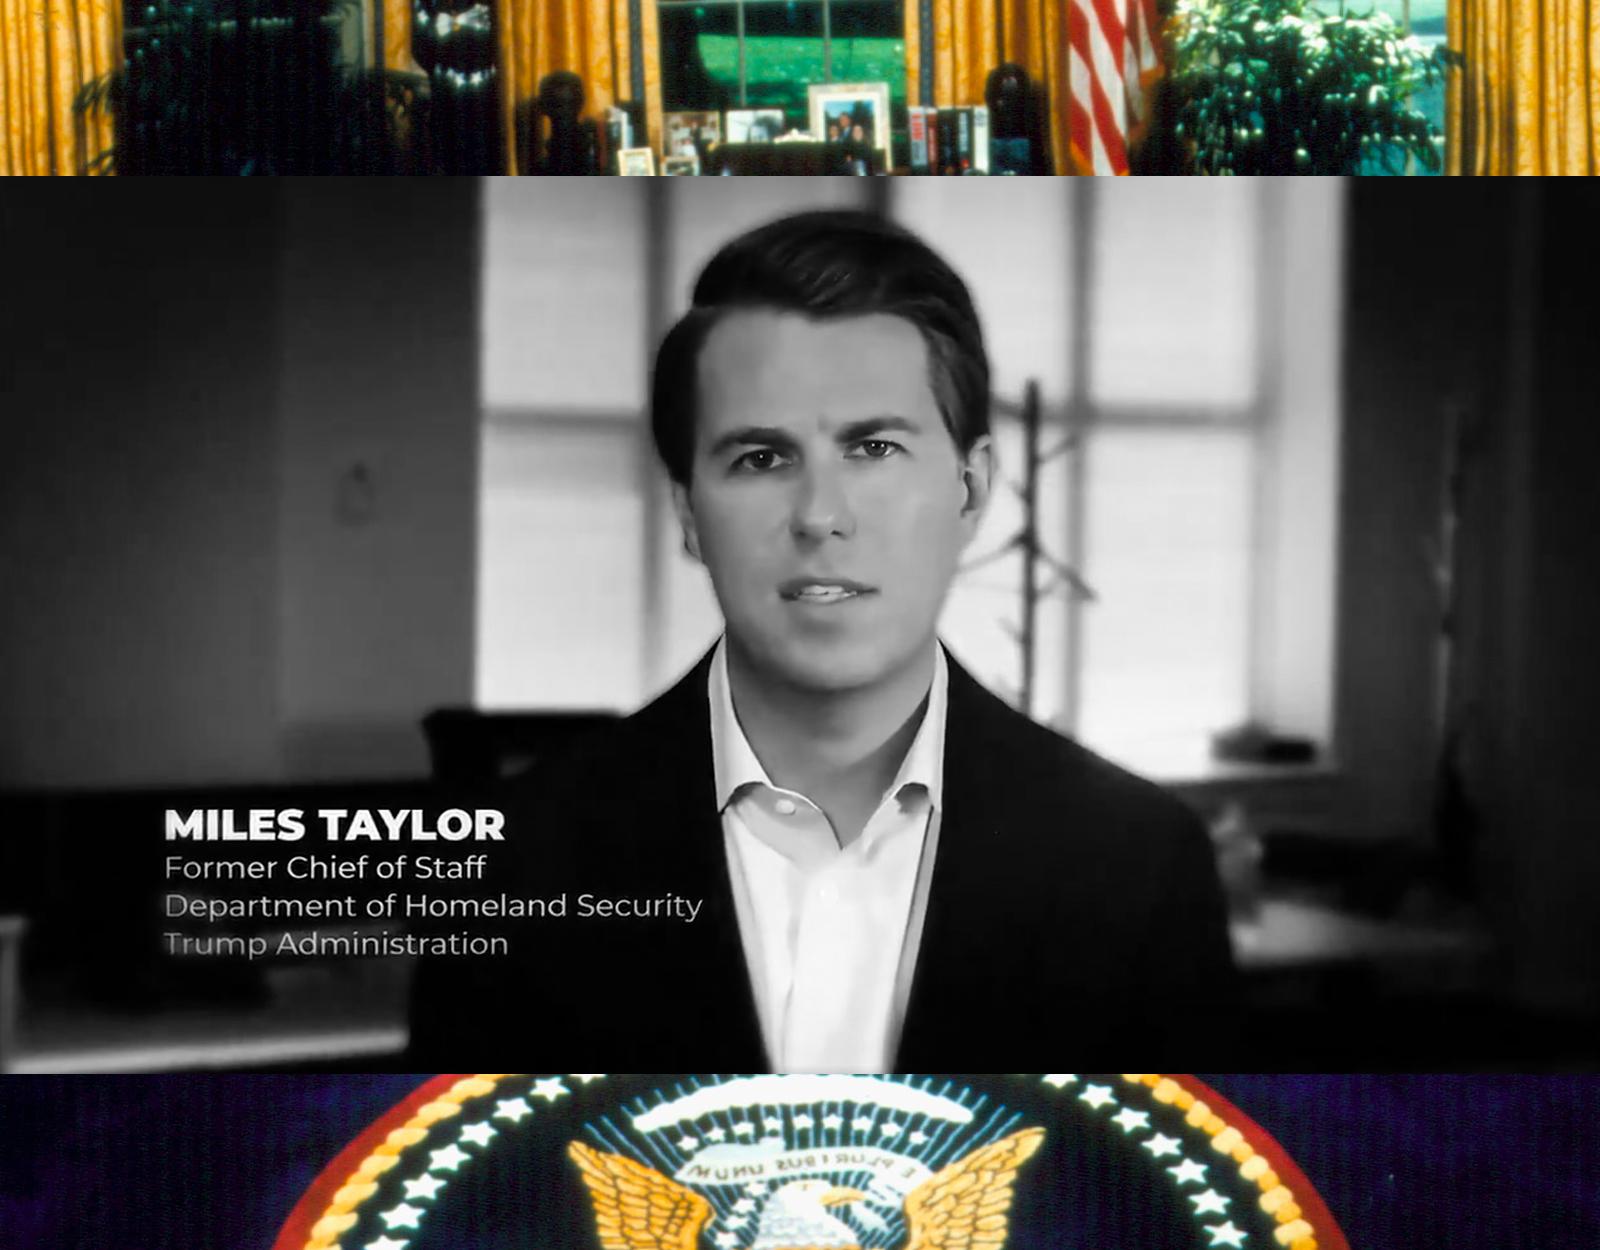 miles taylor - photo #29